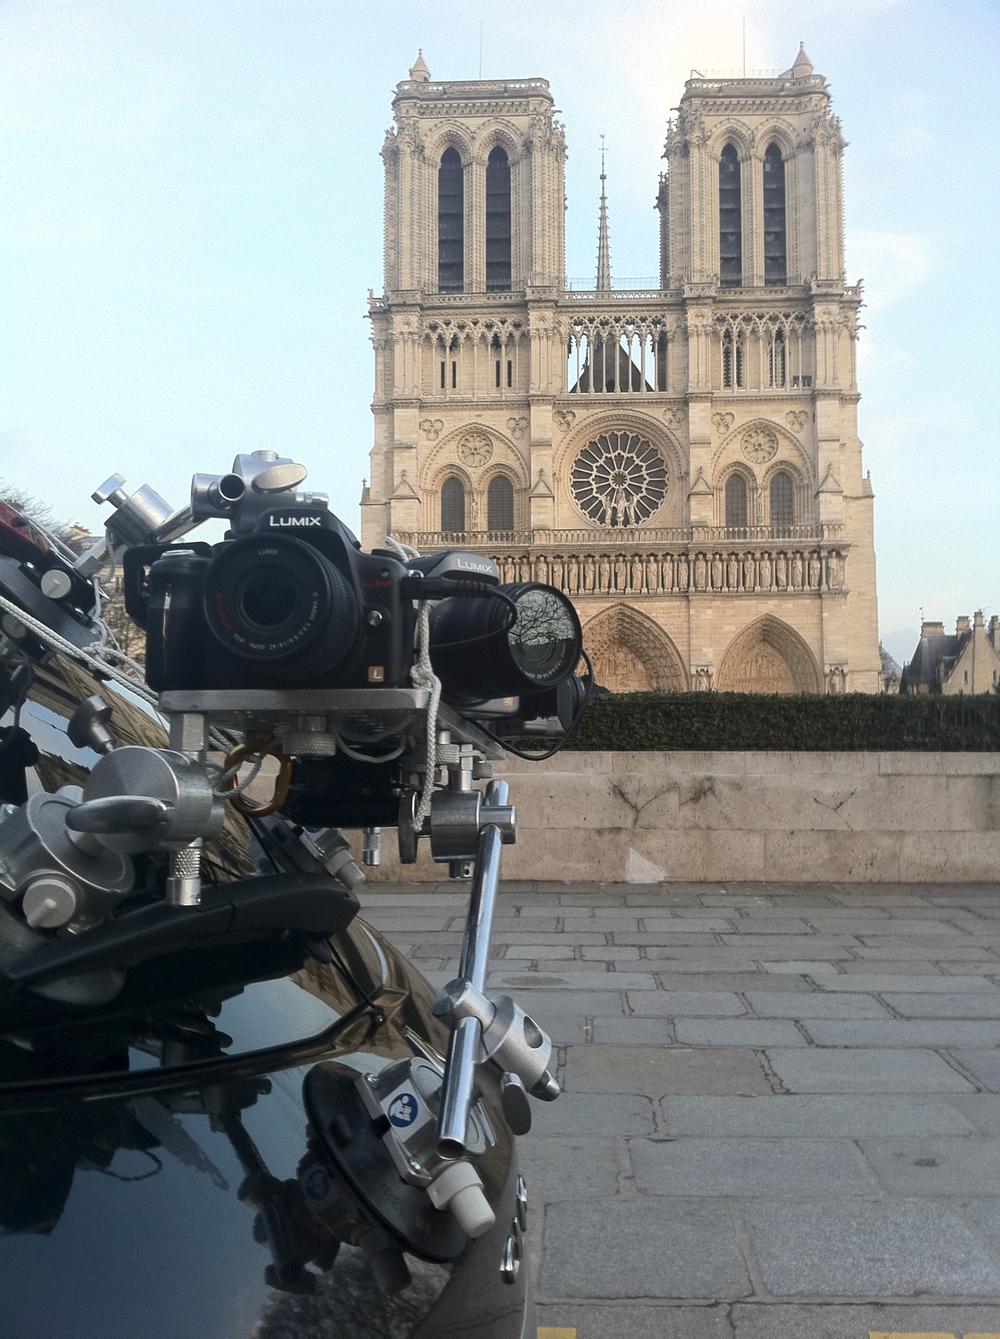 Driving Plates Multicamera Rig Paris Notre Dame